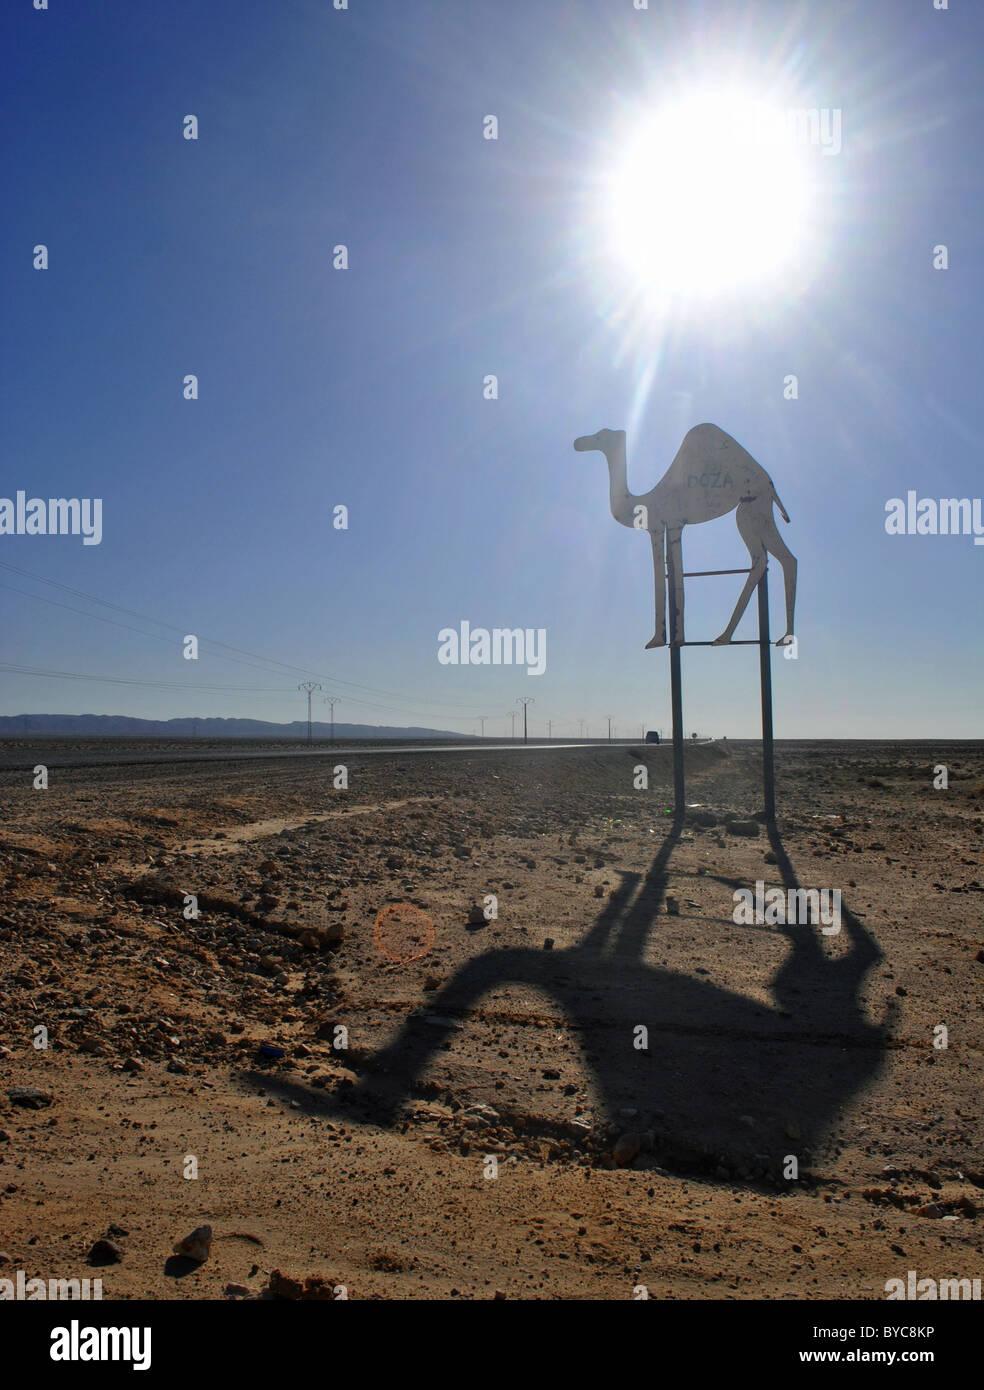 Desert road and camel sign near Douz, Tunisia - Stock Image